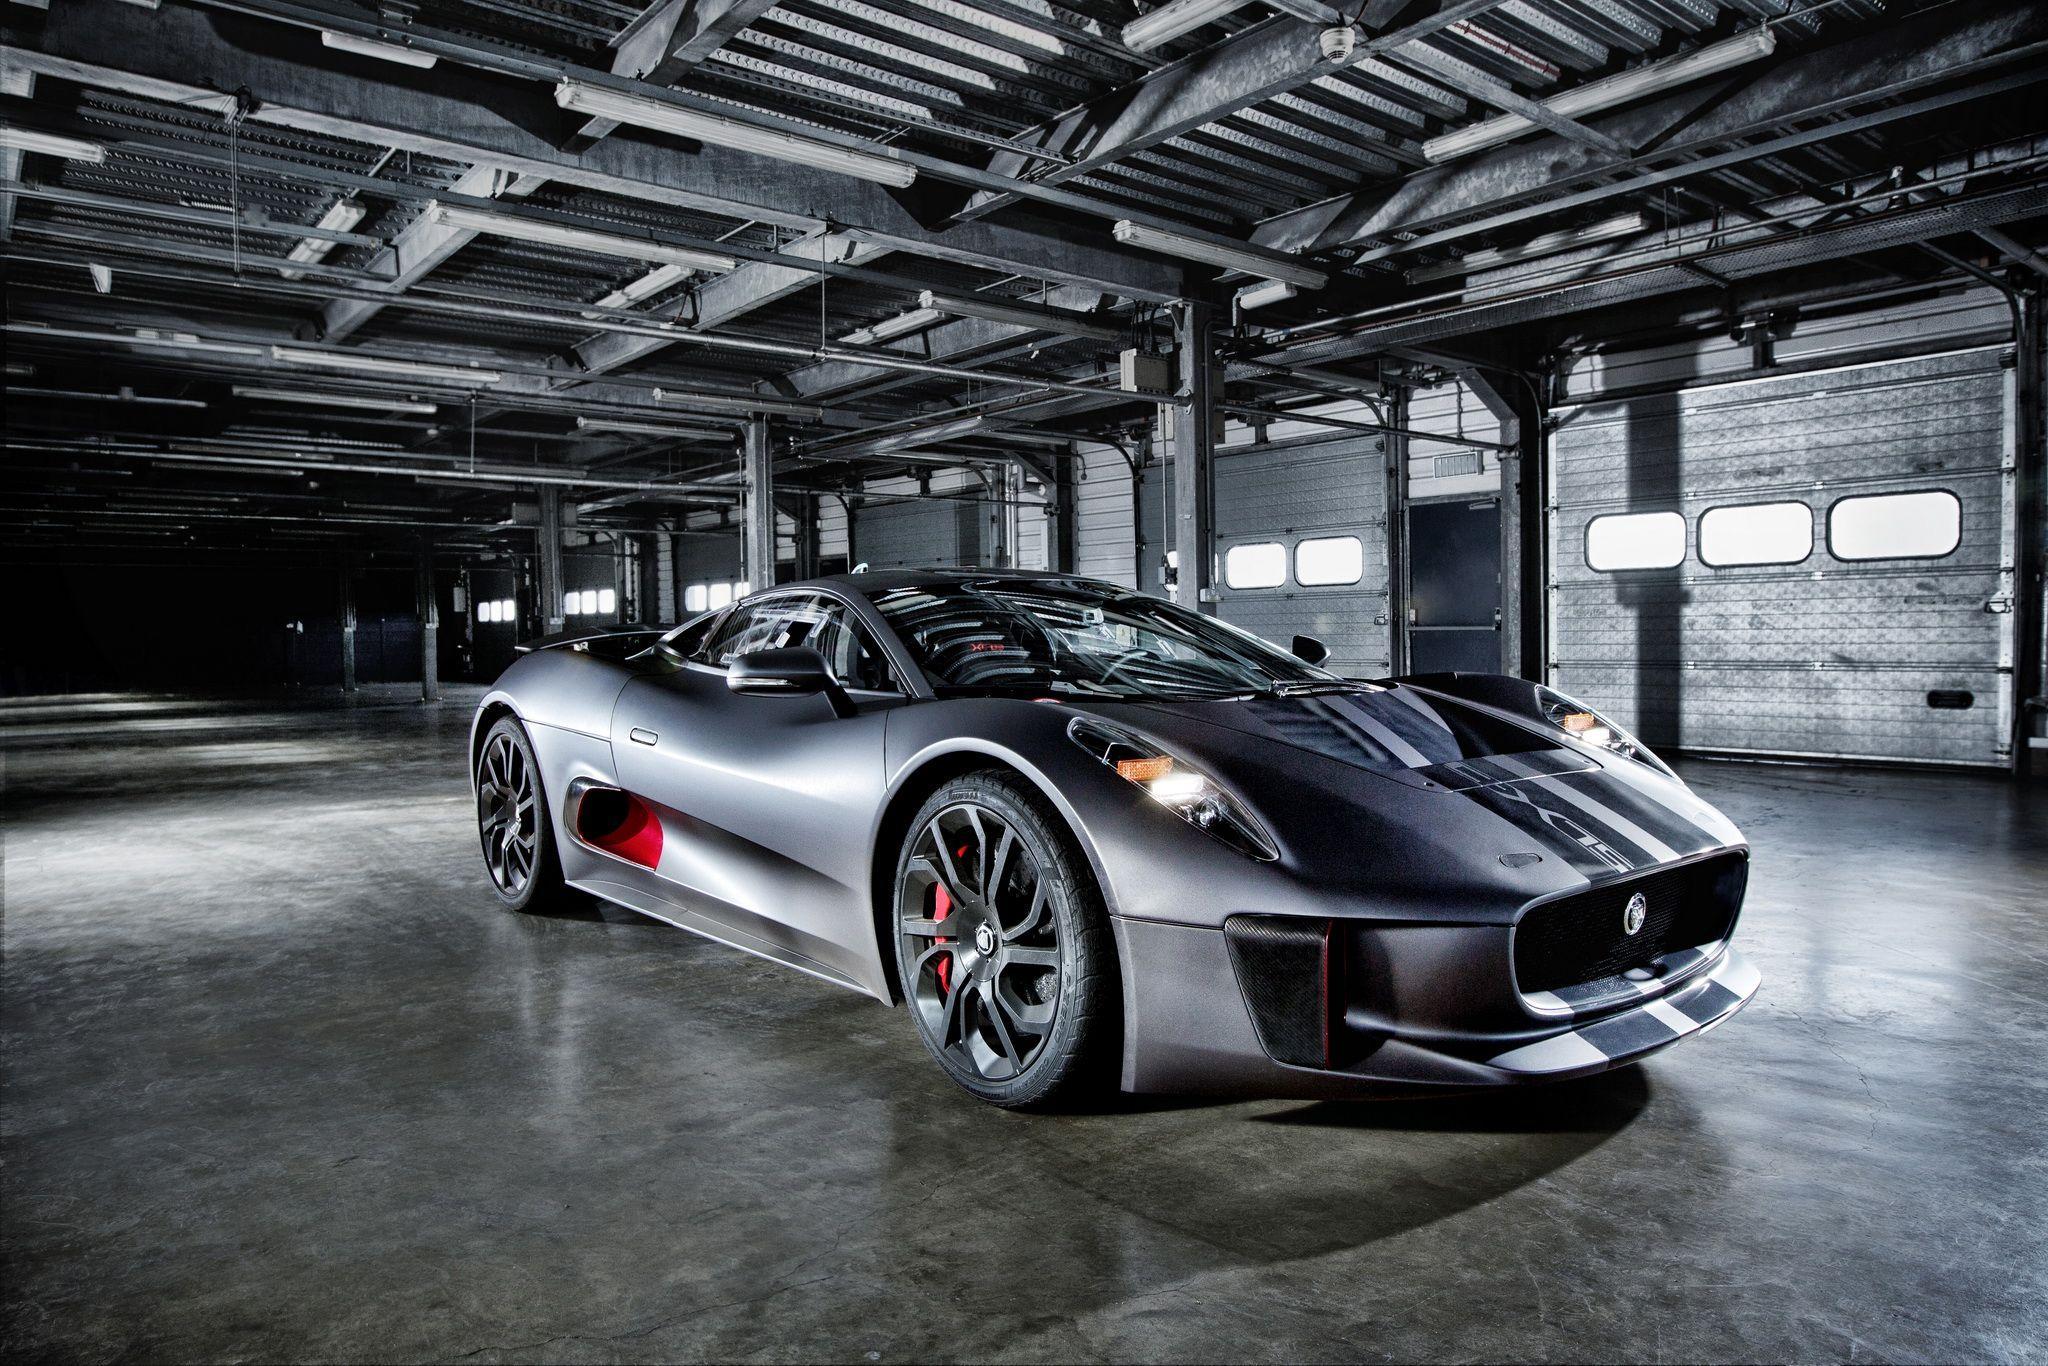 Jaguar Sports Car Wallpapers Top Free Jaguar Sports Car Backgrounds Wallpaperaccess